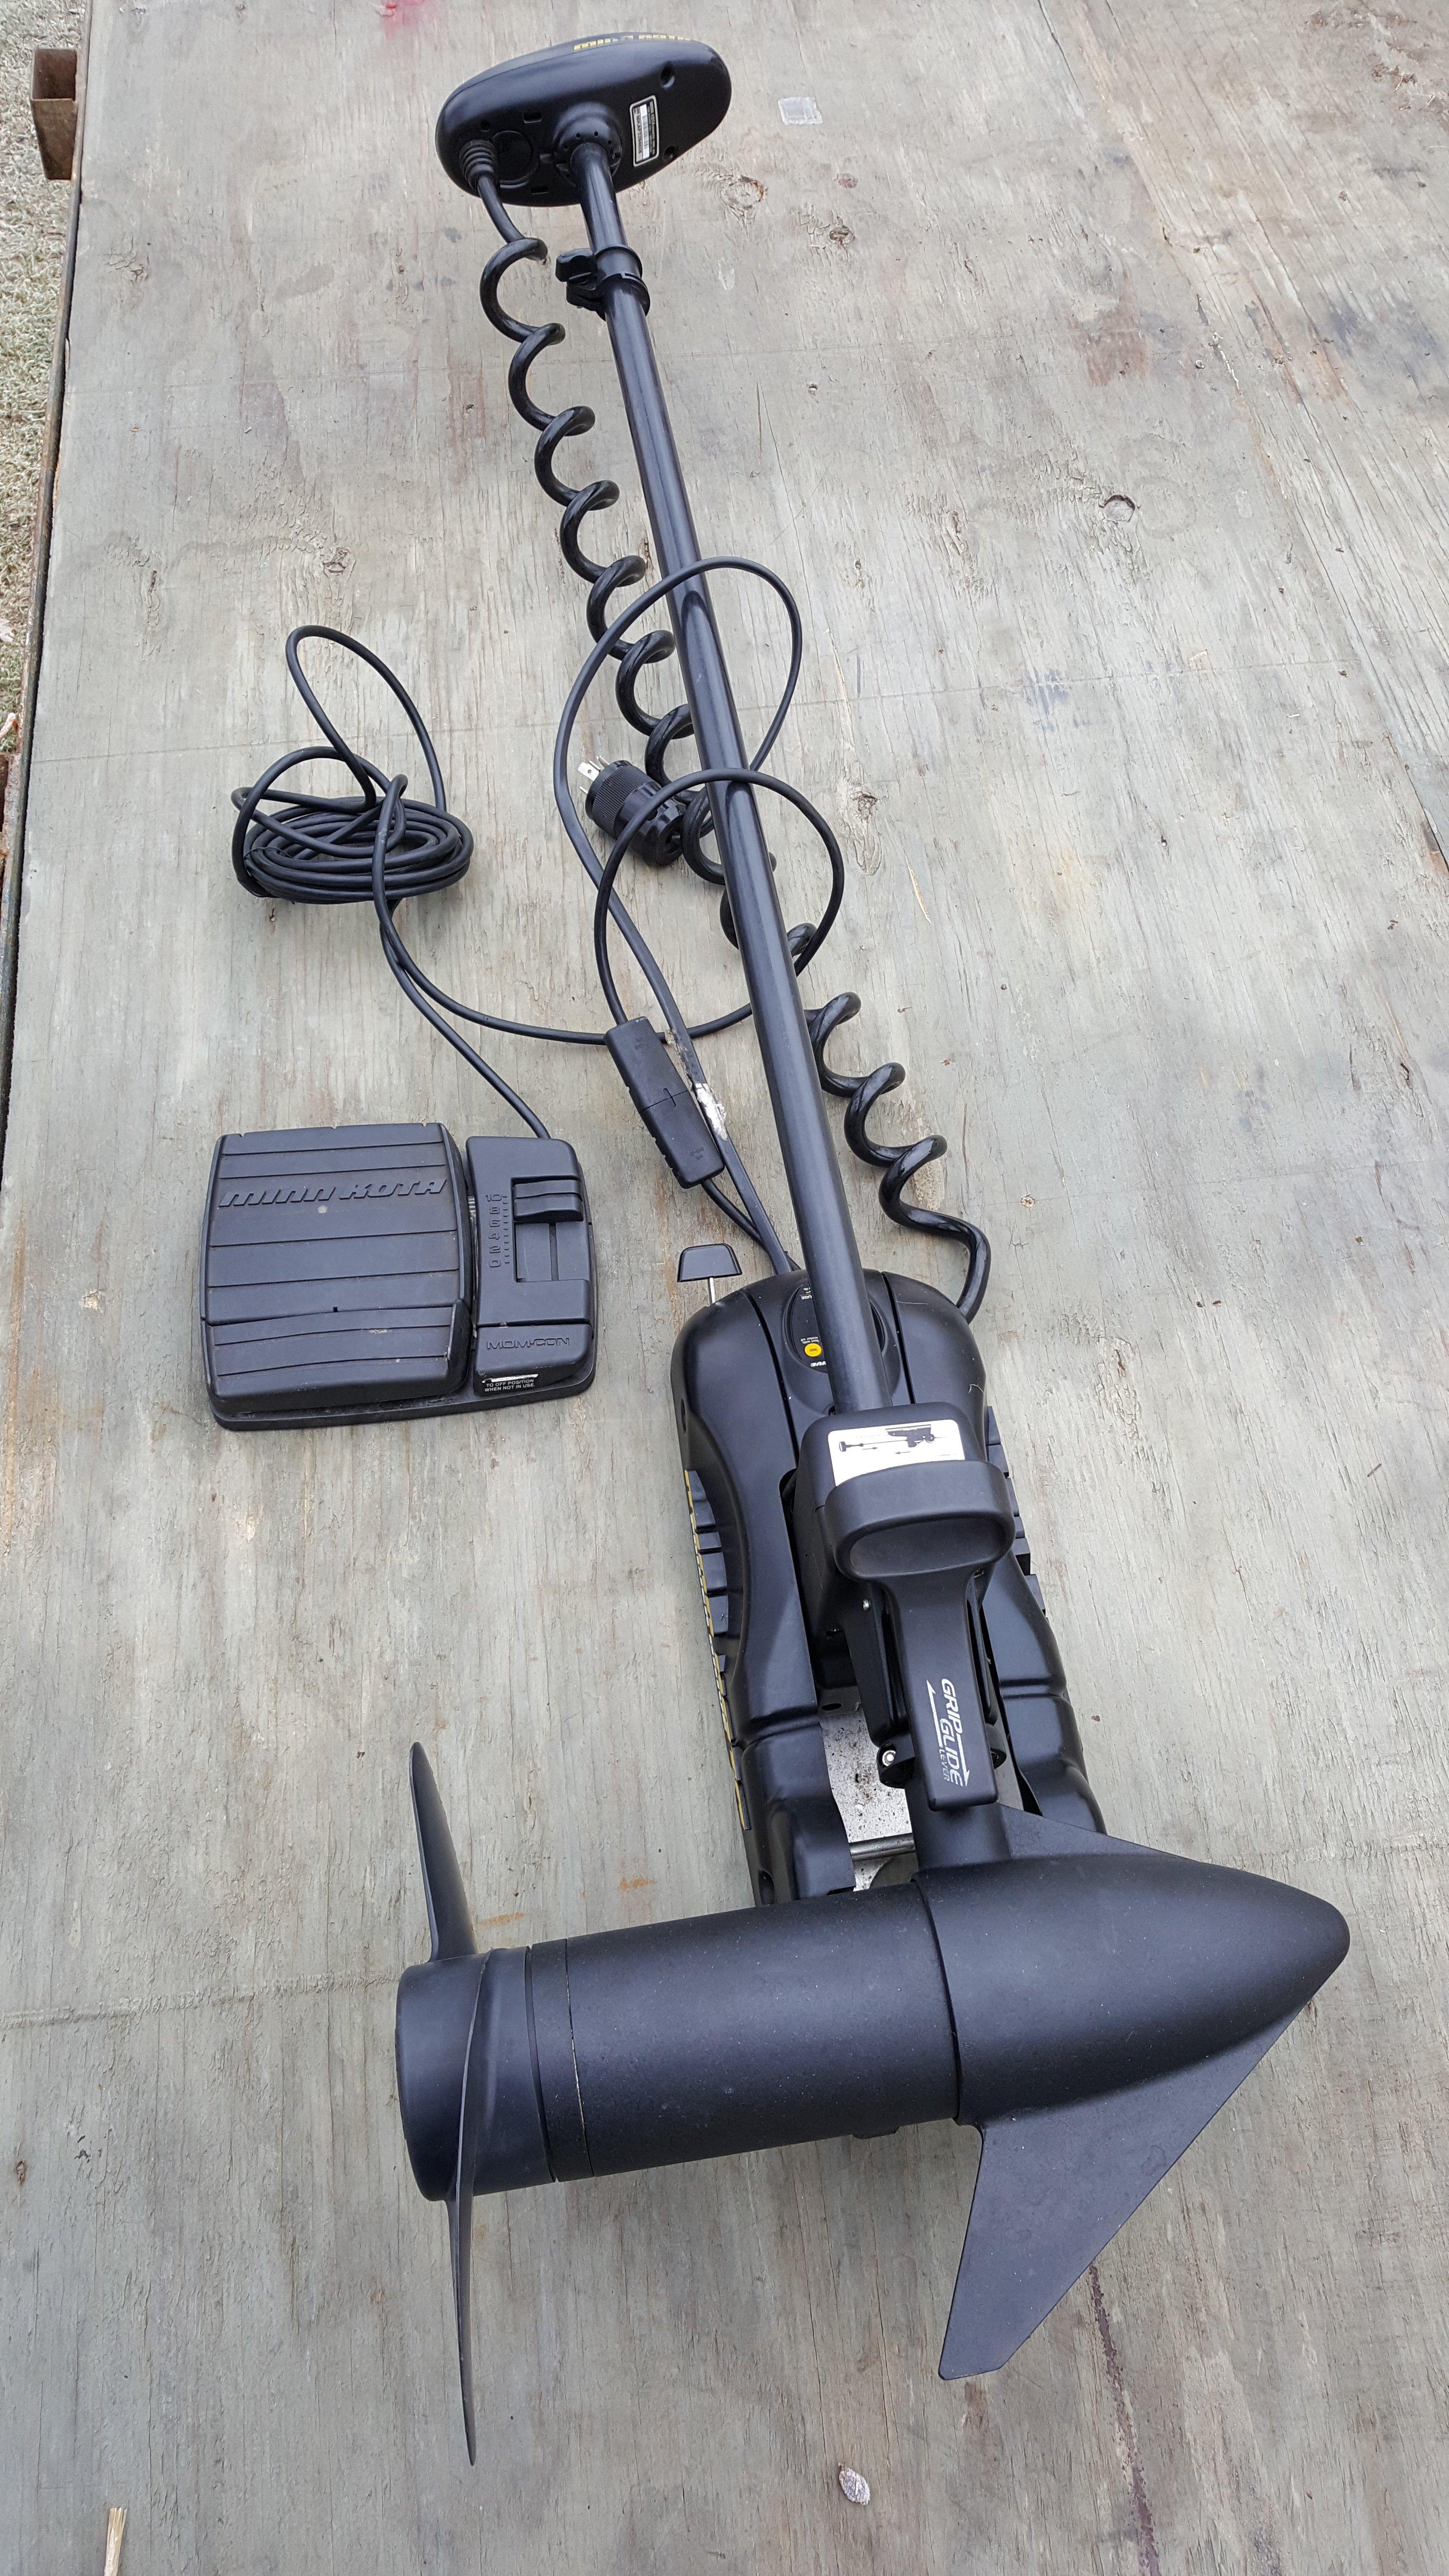 Minn Kota 65 lb Thrust Power Drive - $400 call 5868509226